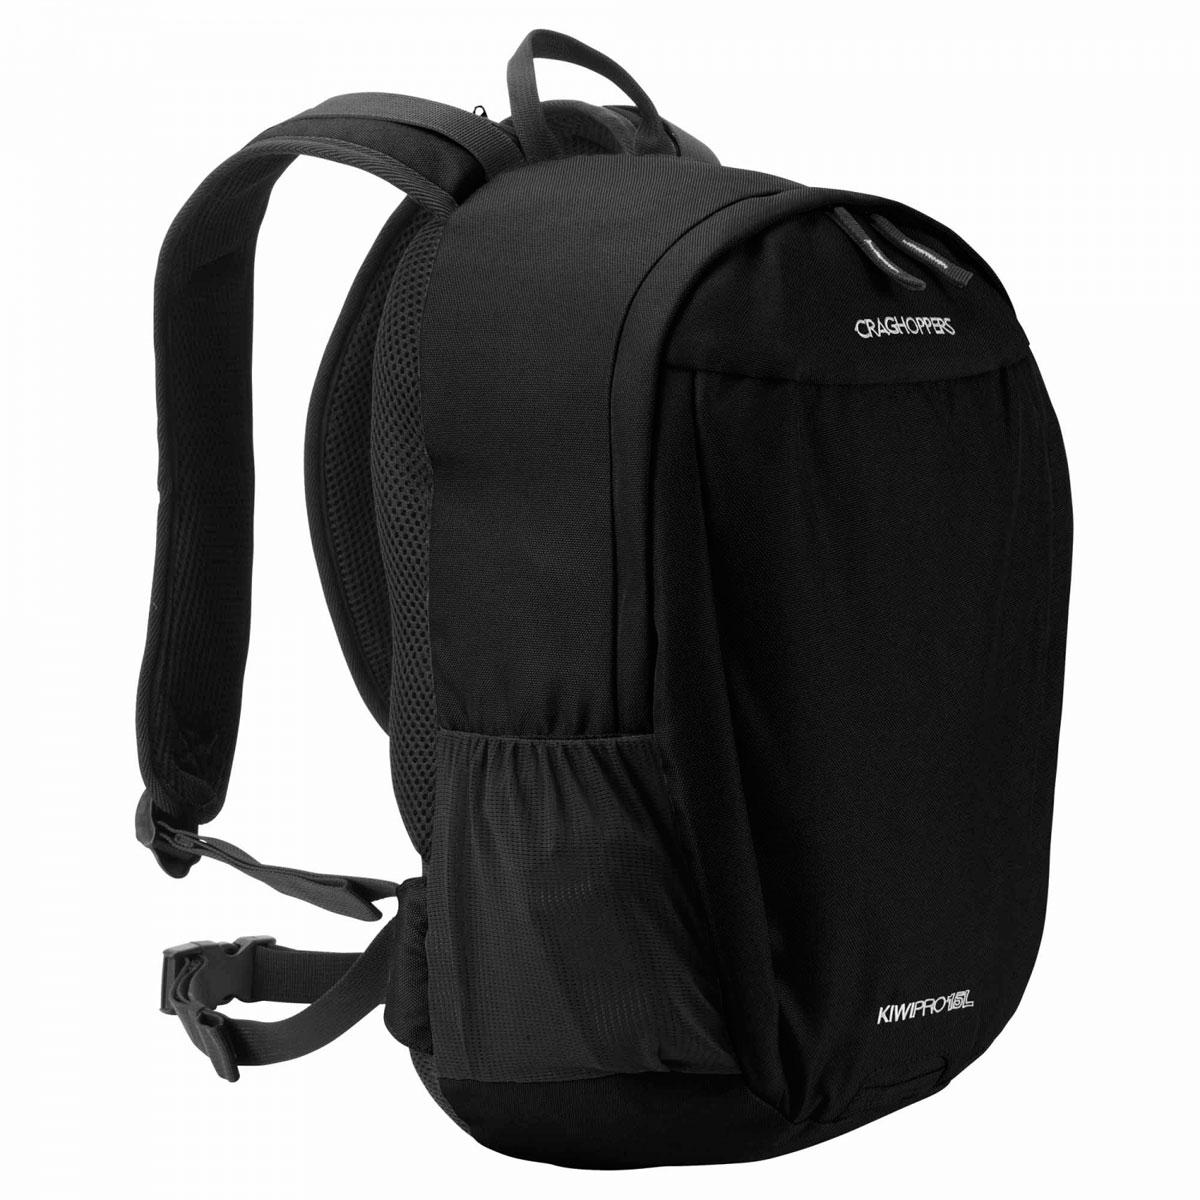 Craghoppers Kiwi Pro Rucksack Backpack